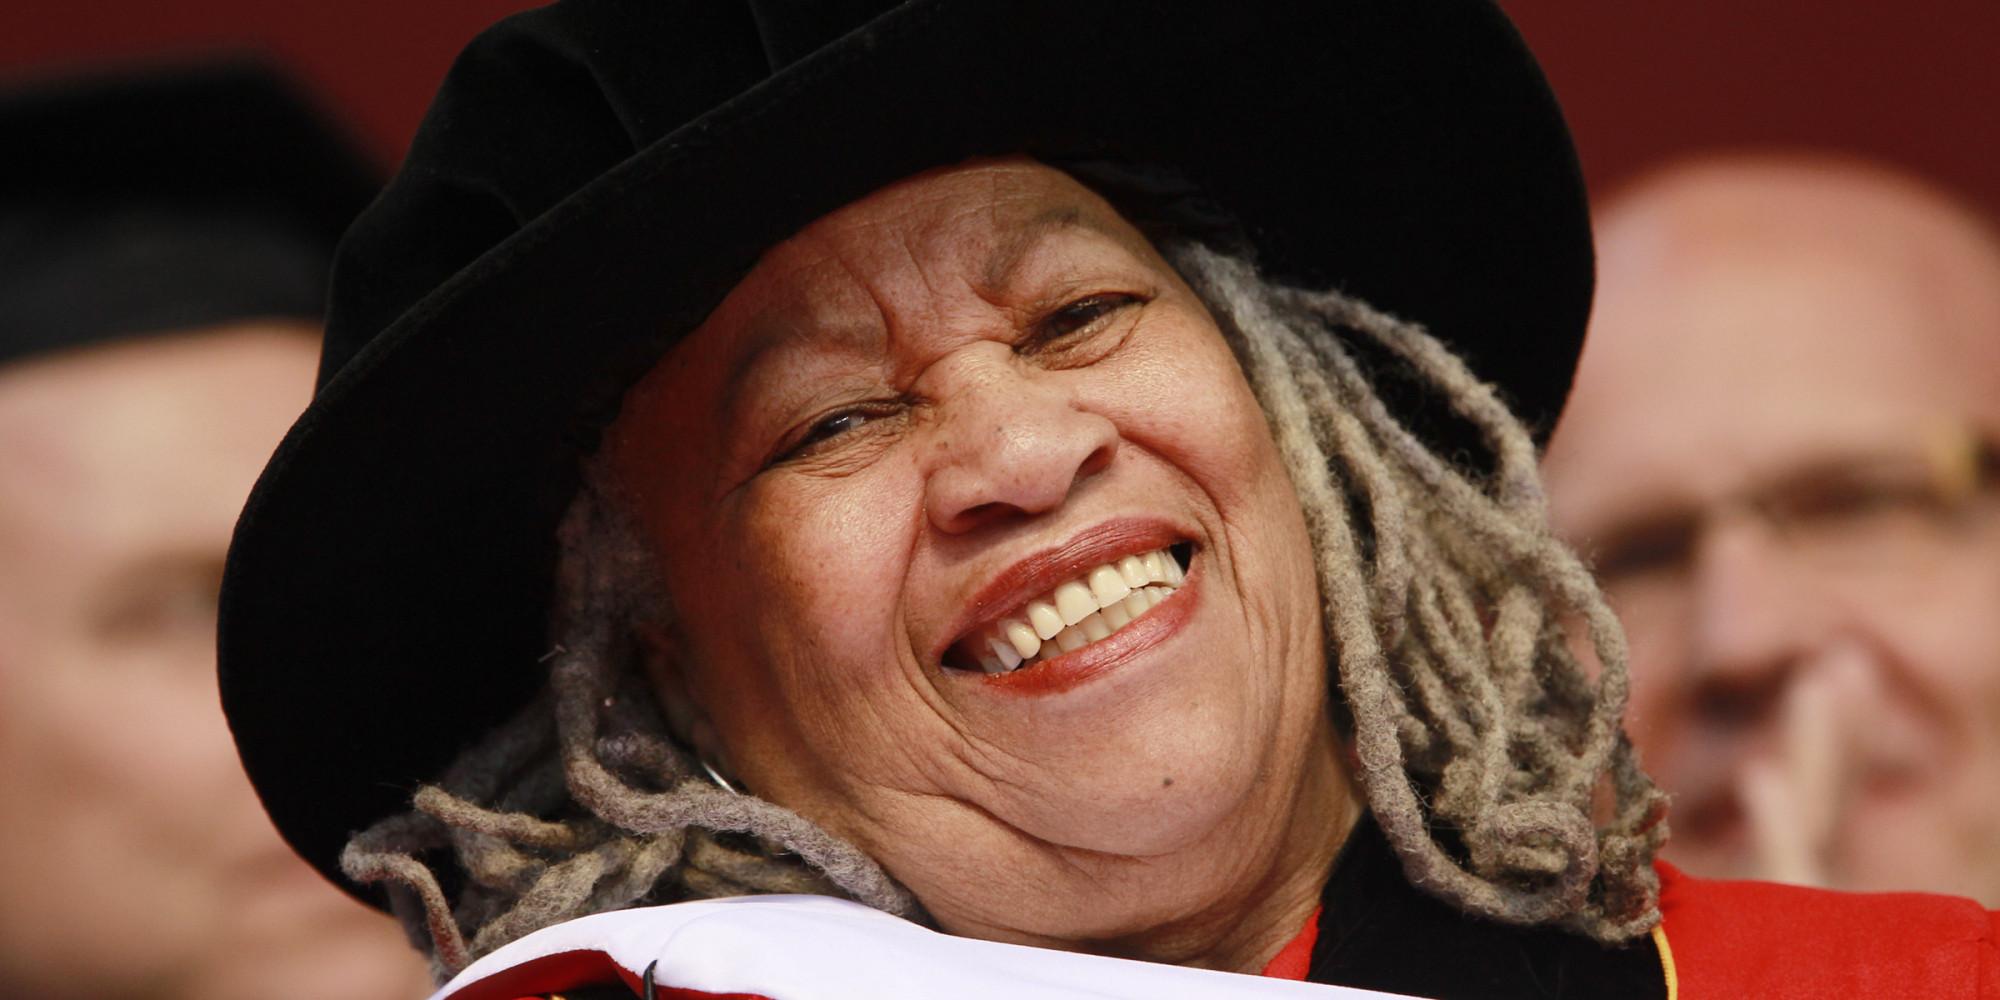 Essays On the Bluest Eye by Toni Morrison